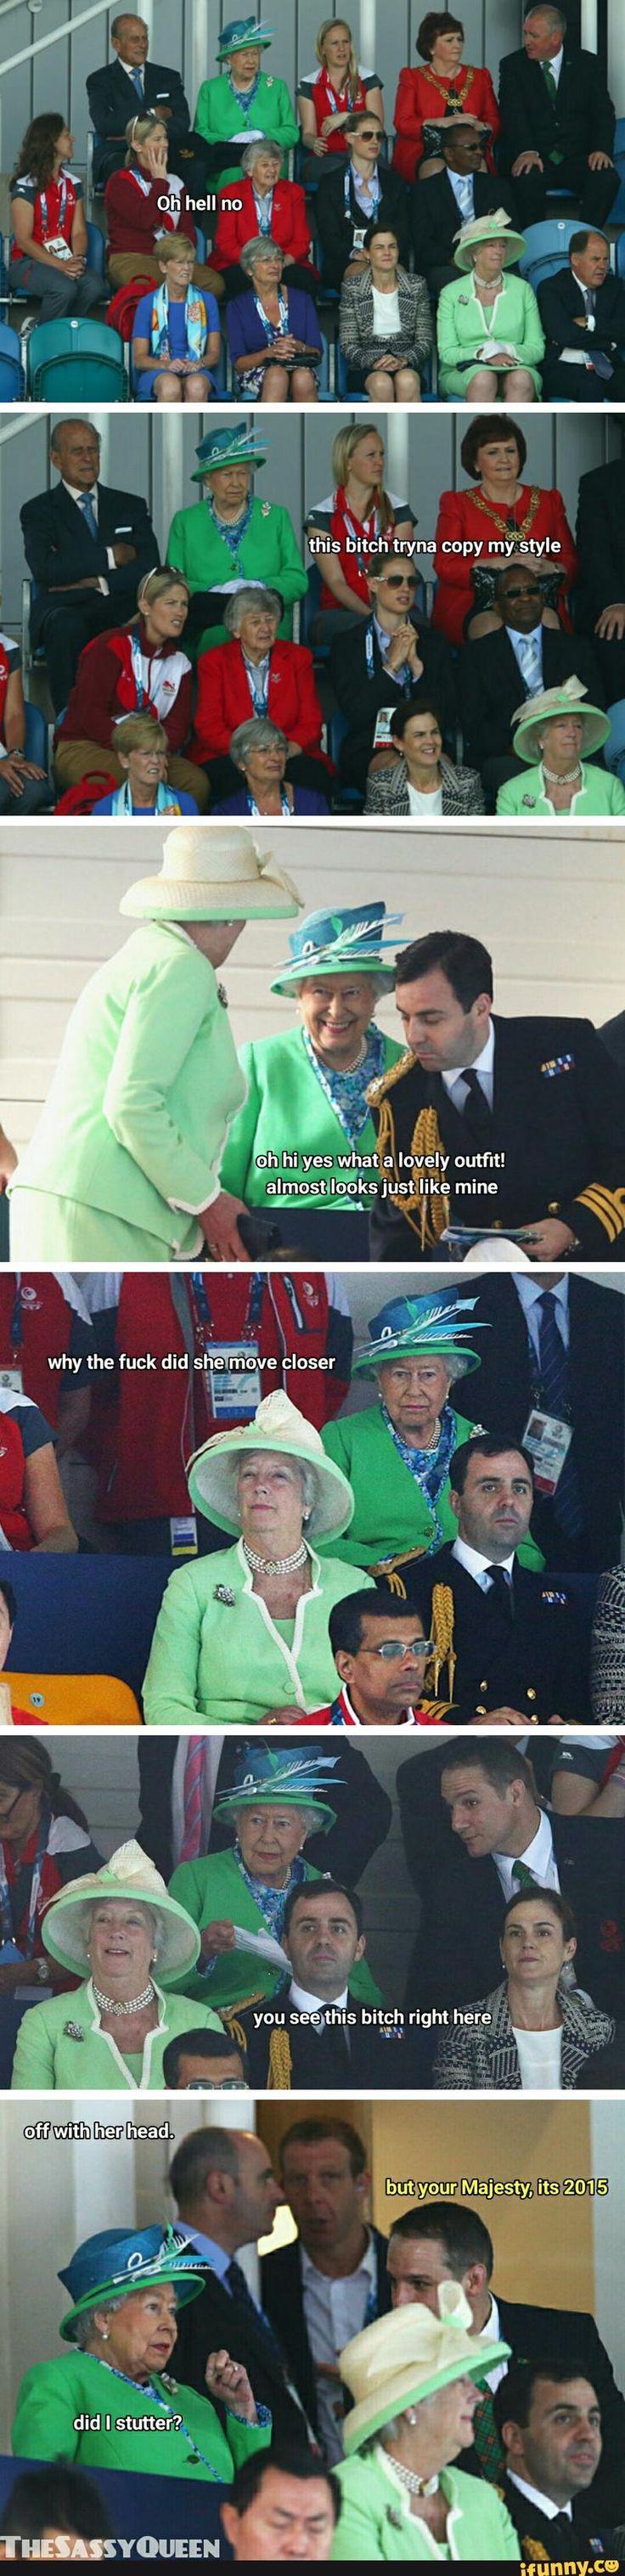 Funny Queen Elizabeth Off With Her Head! Meme Strip